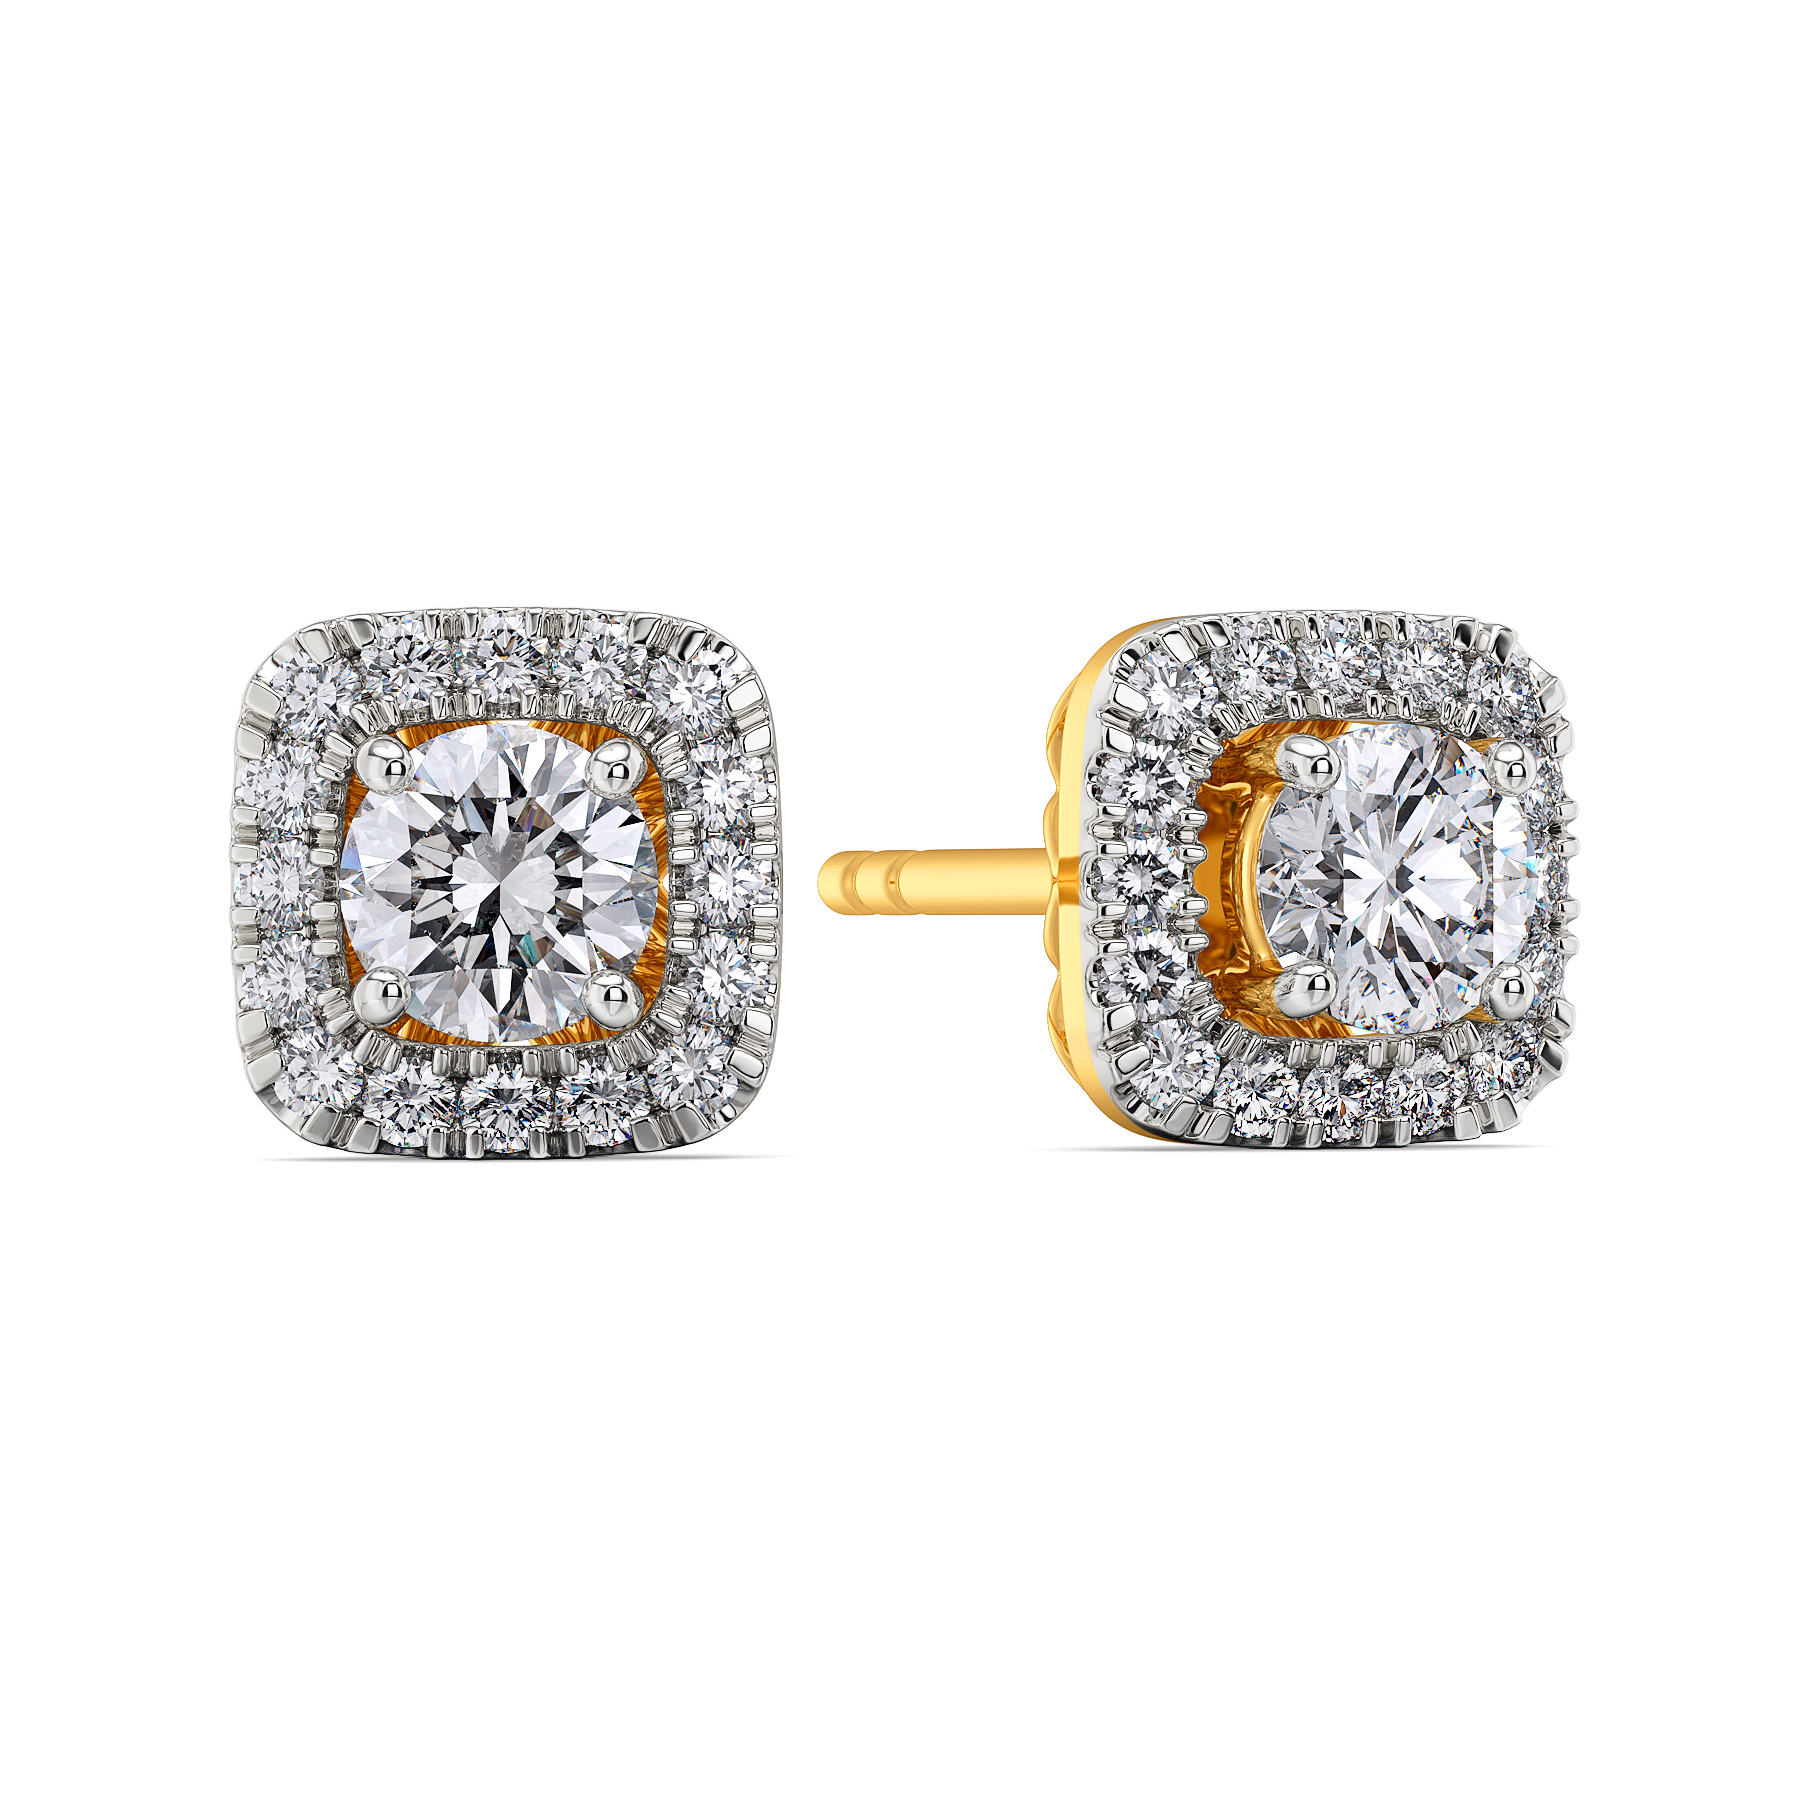 Square N Shine Diamond Earrings